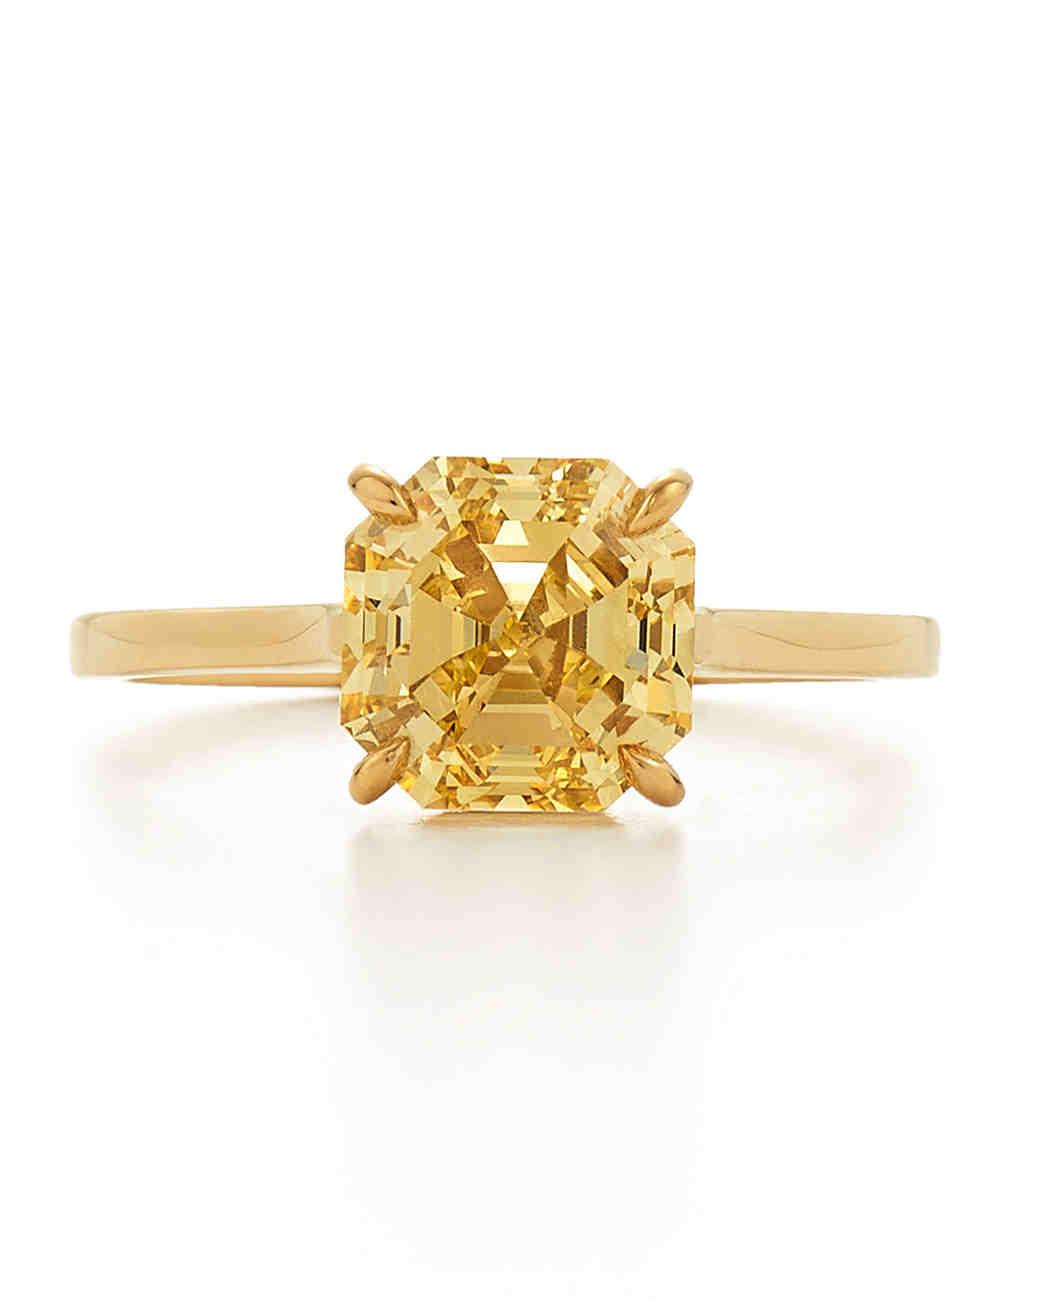 Emerald Diamond Wedding Rings 016 - Emerald Diamond Wedding Rings